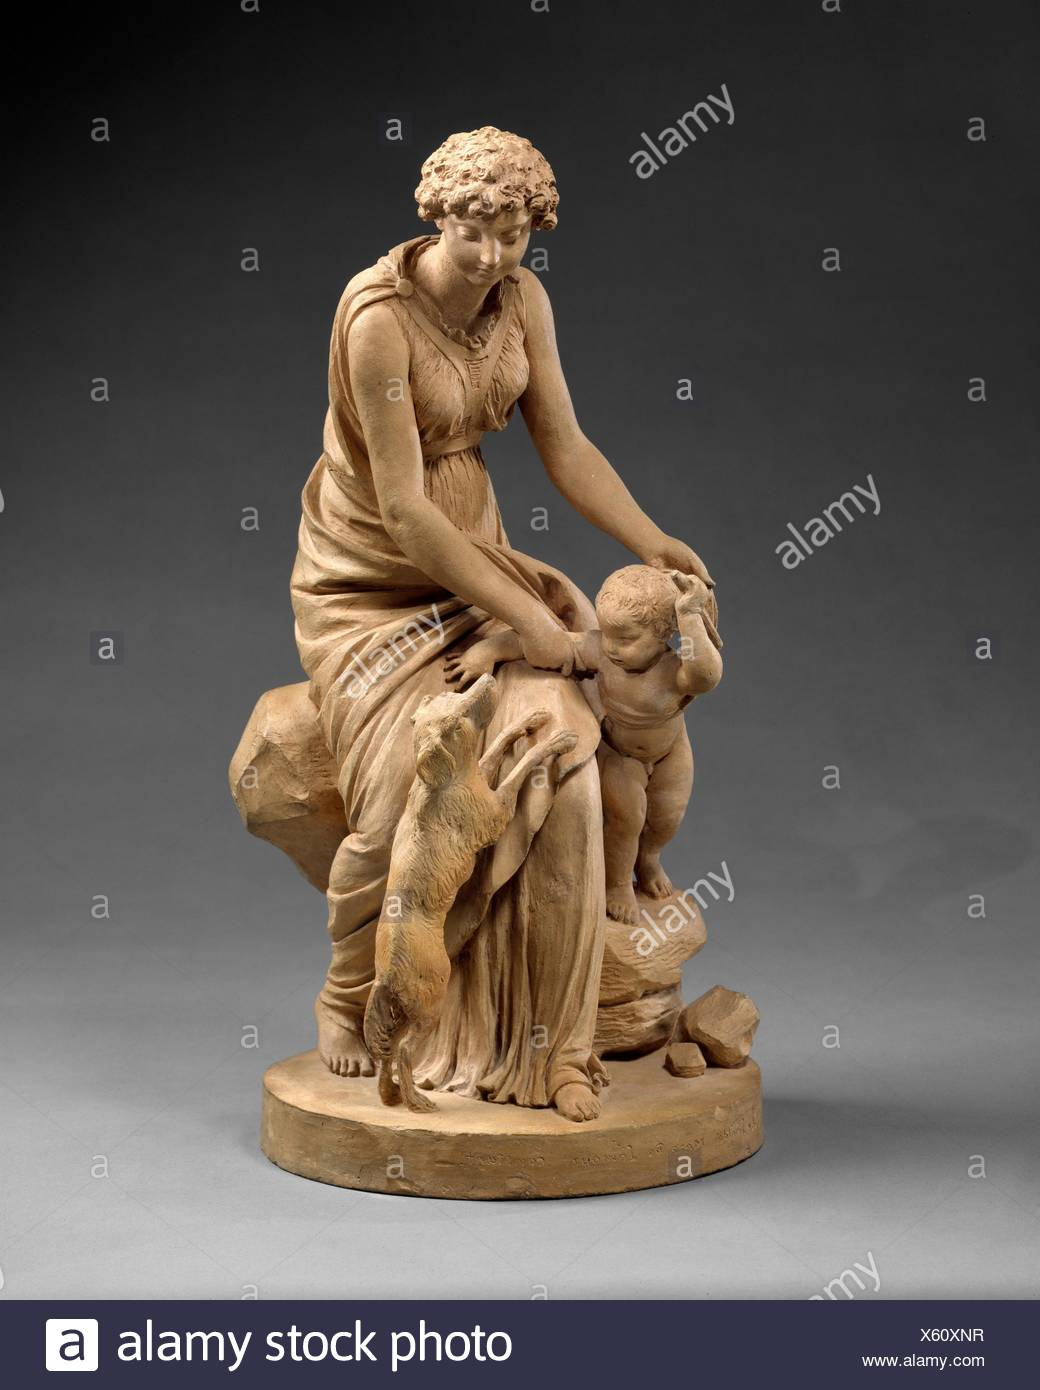 Fidelity, the Mother of Constant Love. Artist: Augustin Pajou (French, Paris 1730-1809 Paris); Date: 1799; Culture: French, Paris; Medium: - Stock Image